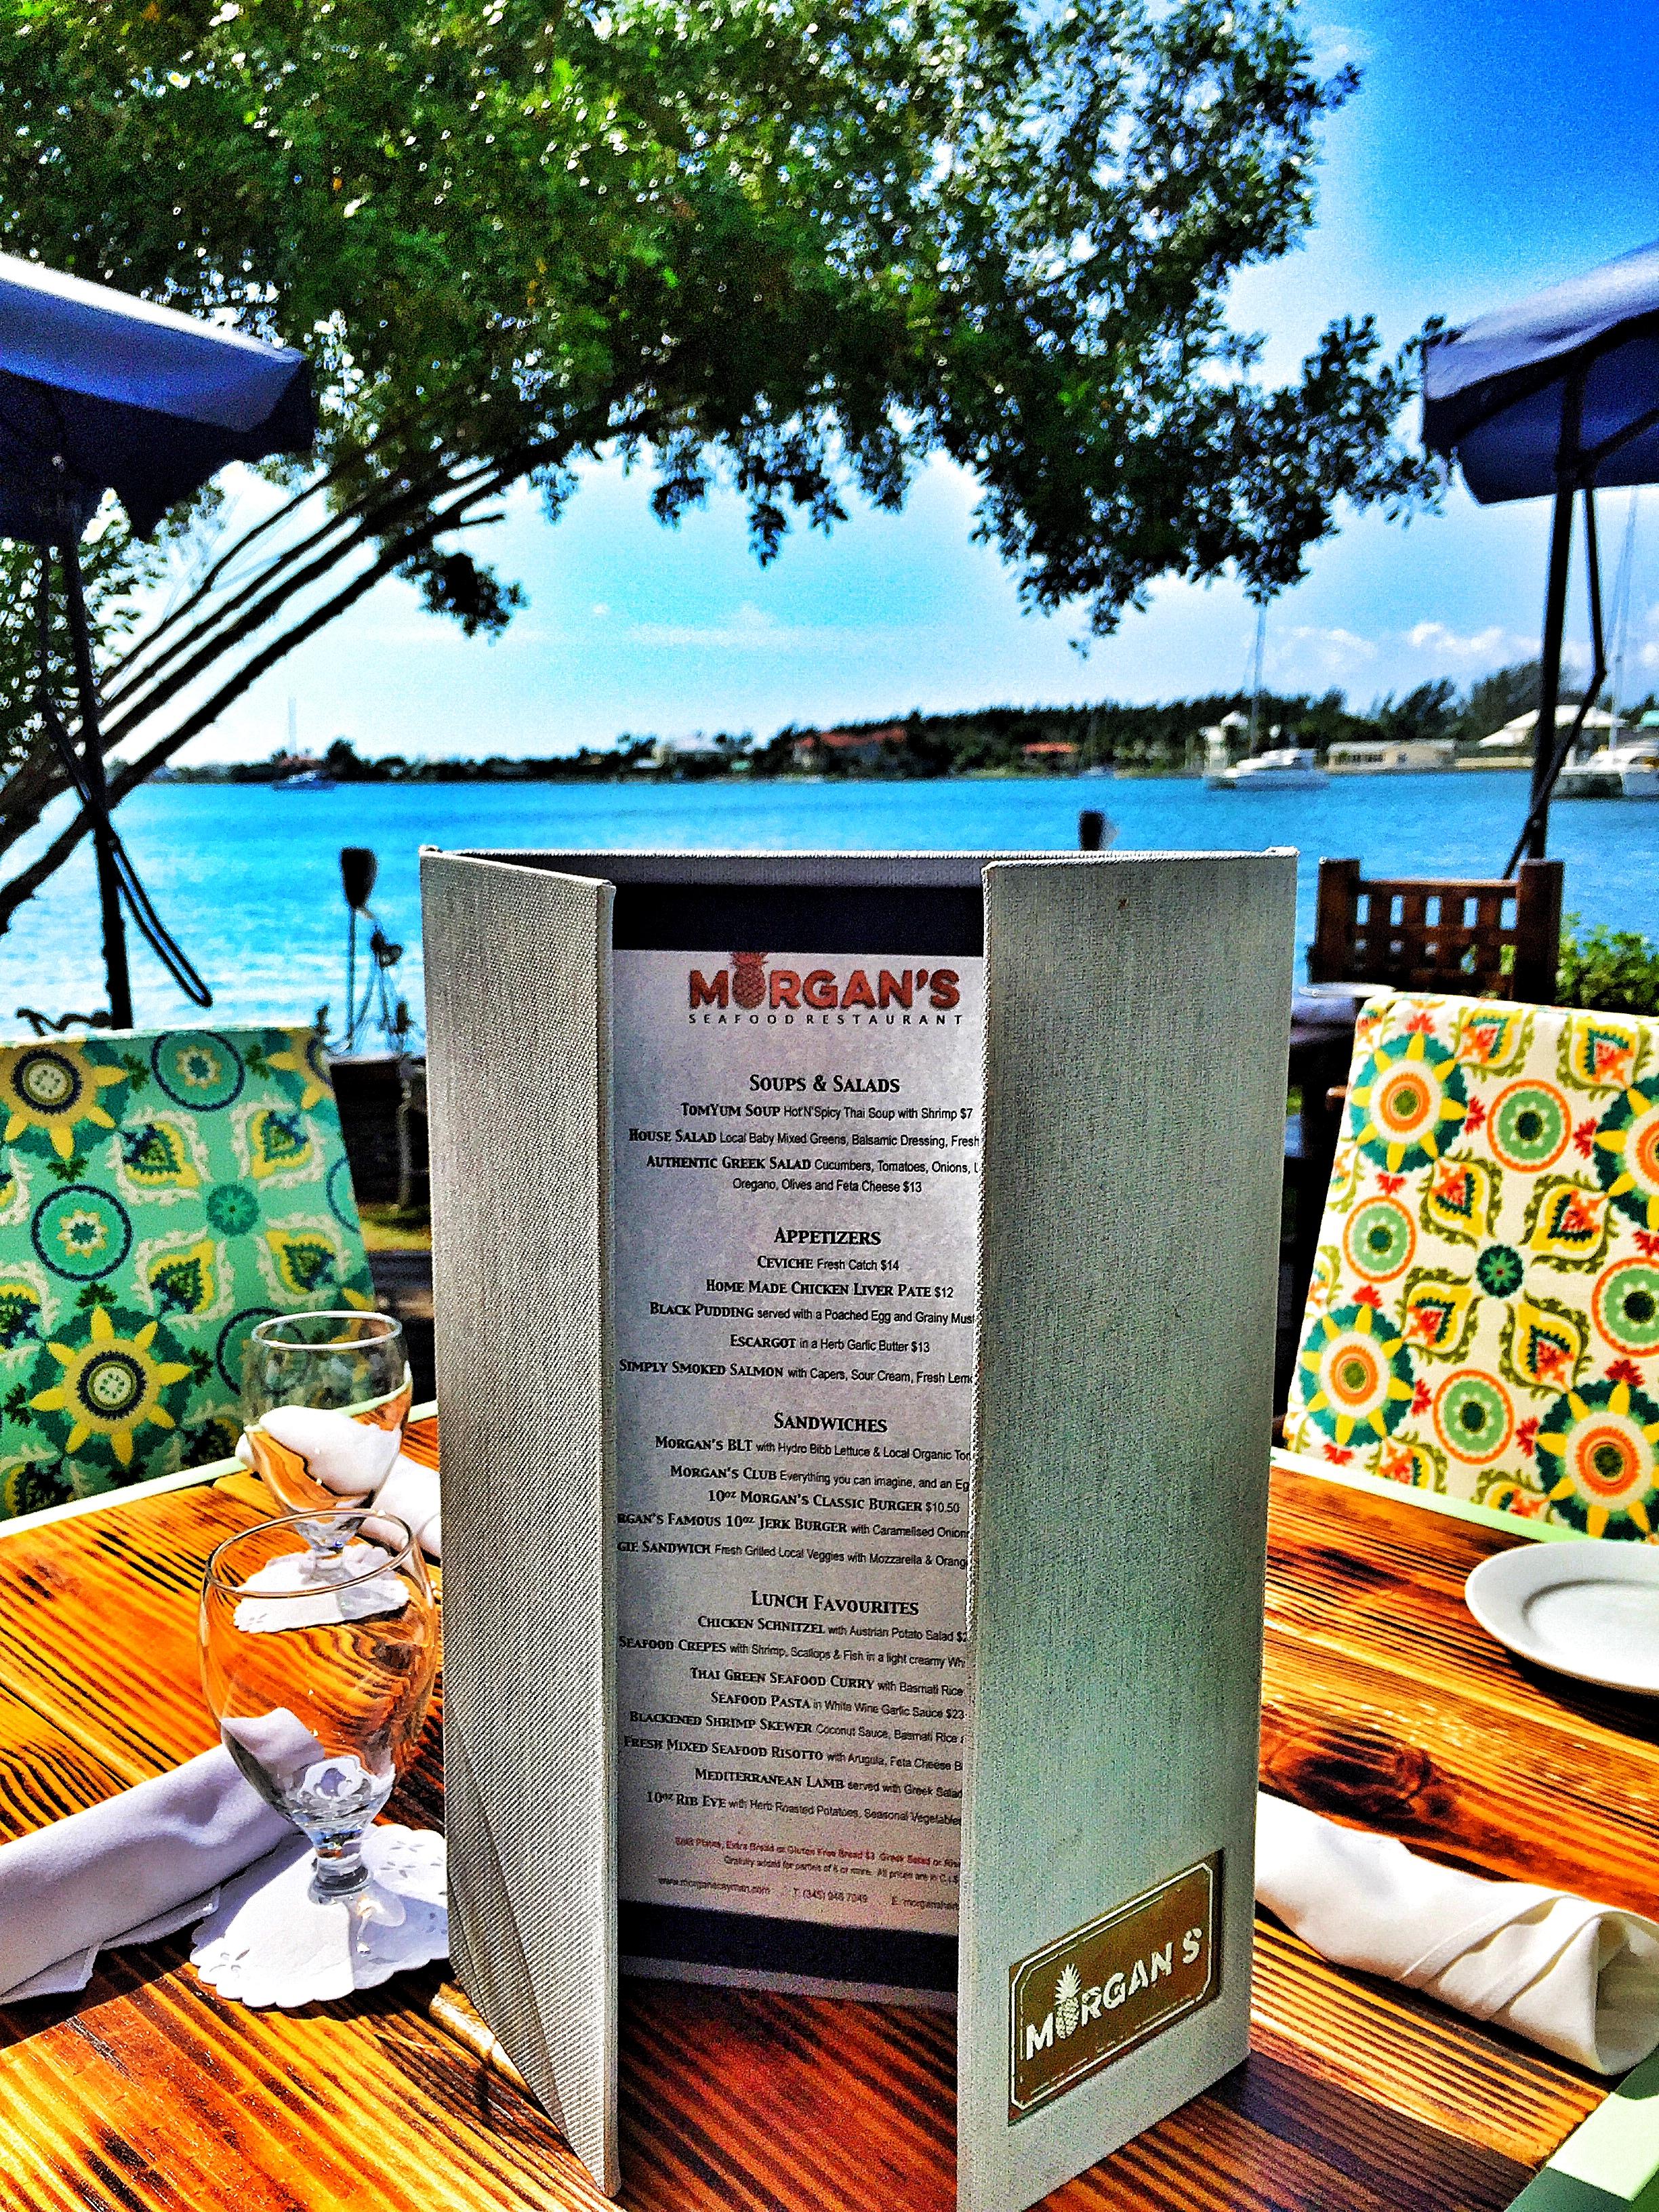 Morgans Cayman Food and Drink Menu